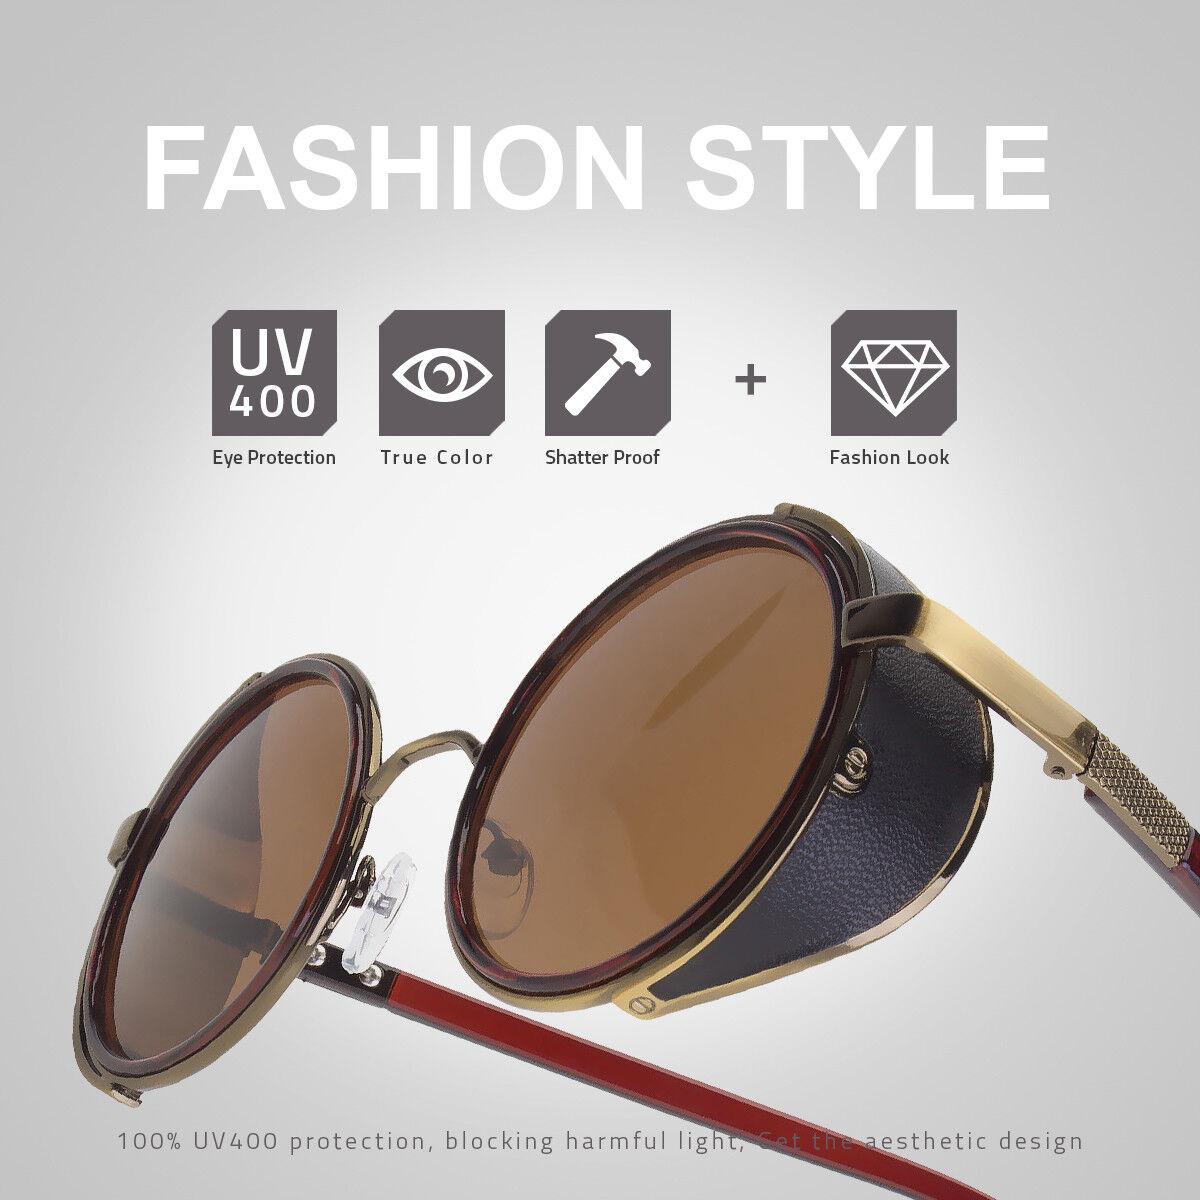 5eccb0ab4970 4 of 6 Unise Vintage Retro Mirror Round SUN Glasses Goggles Steampunk Punk  Sunglasses